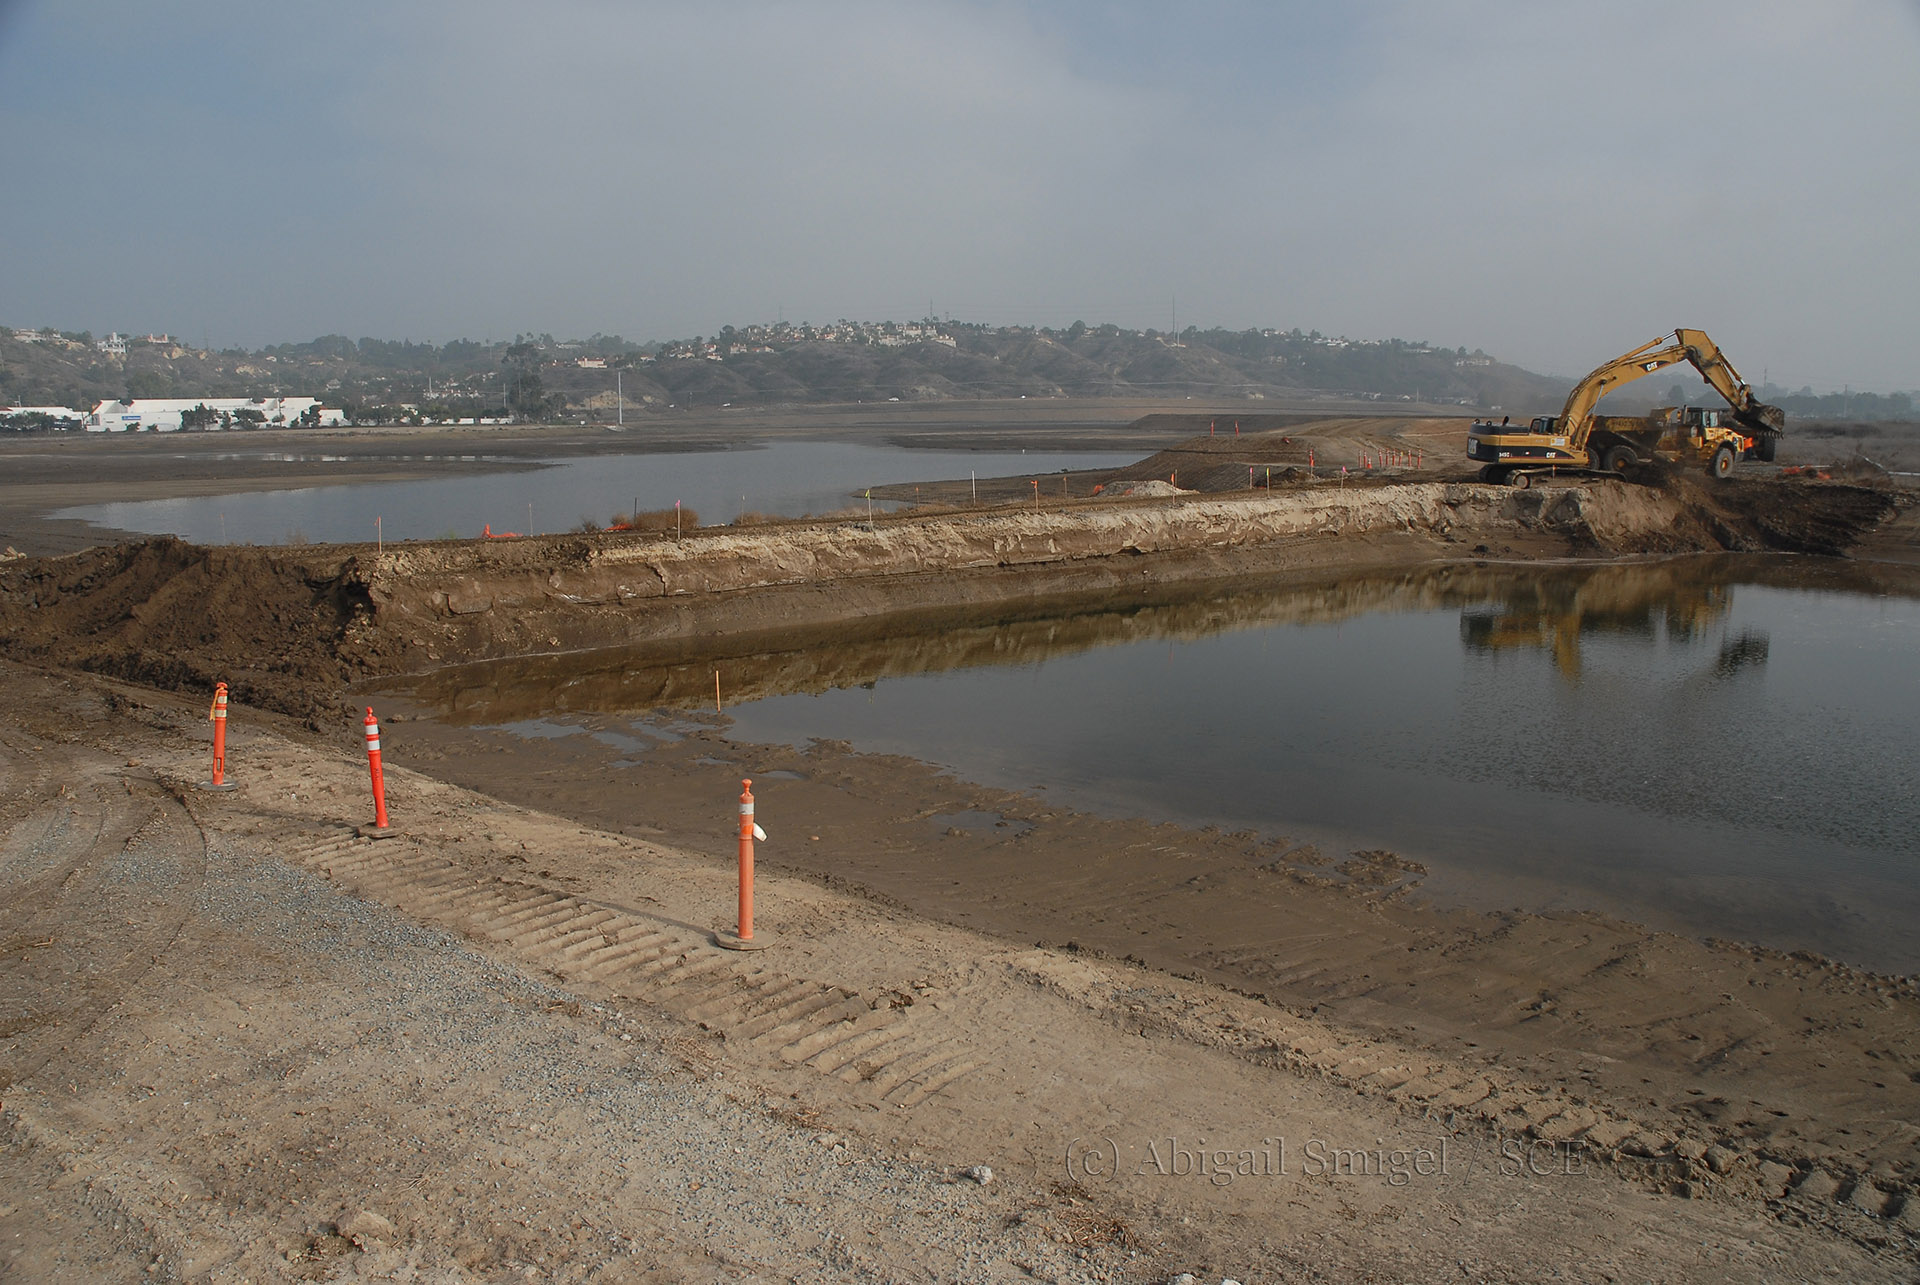 Coastal Environments Projects: San Dieguito Lagoon (Wetland Restoration)